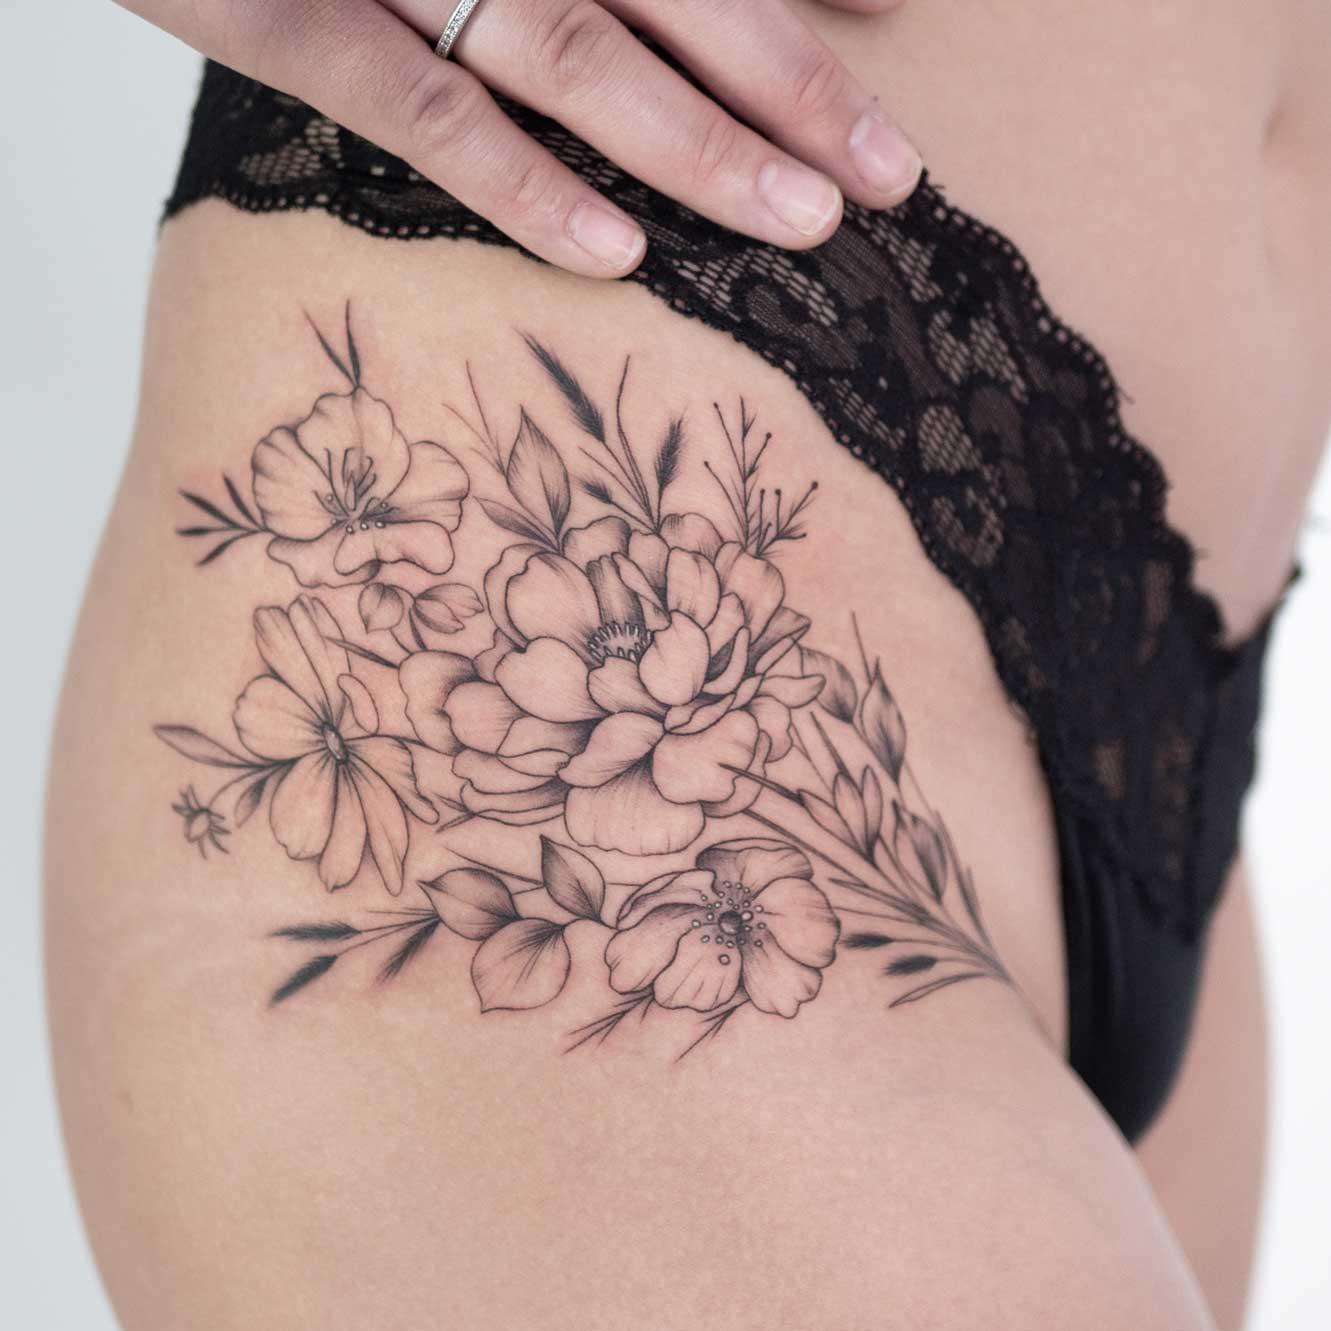 tatouage-hanche-fin-toulouse